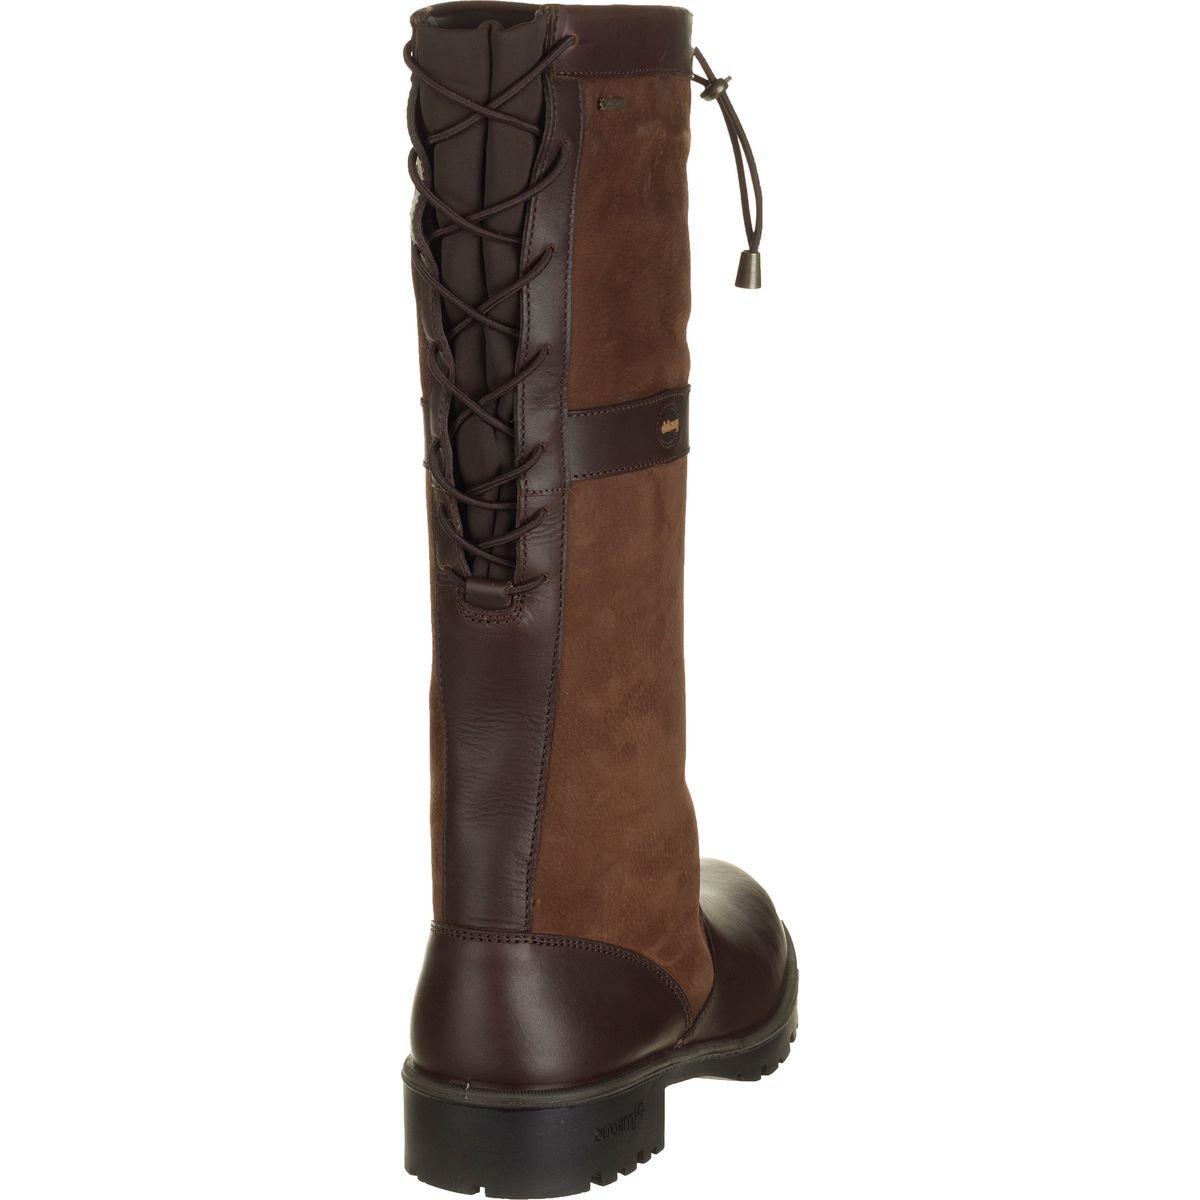 Dubarry Glanmire, Dry Fast - - Fast Dry Soft Leder, Walnut 3944-52 136b8d